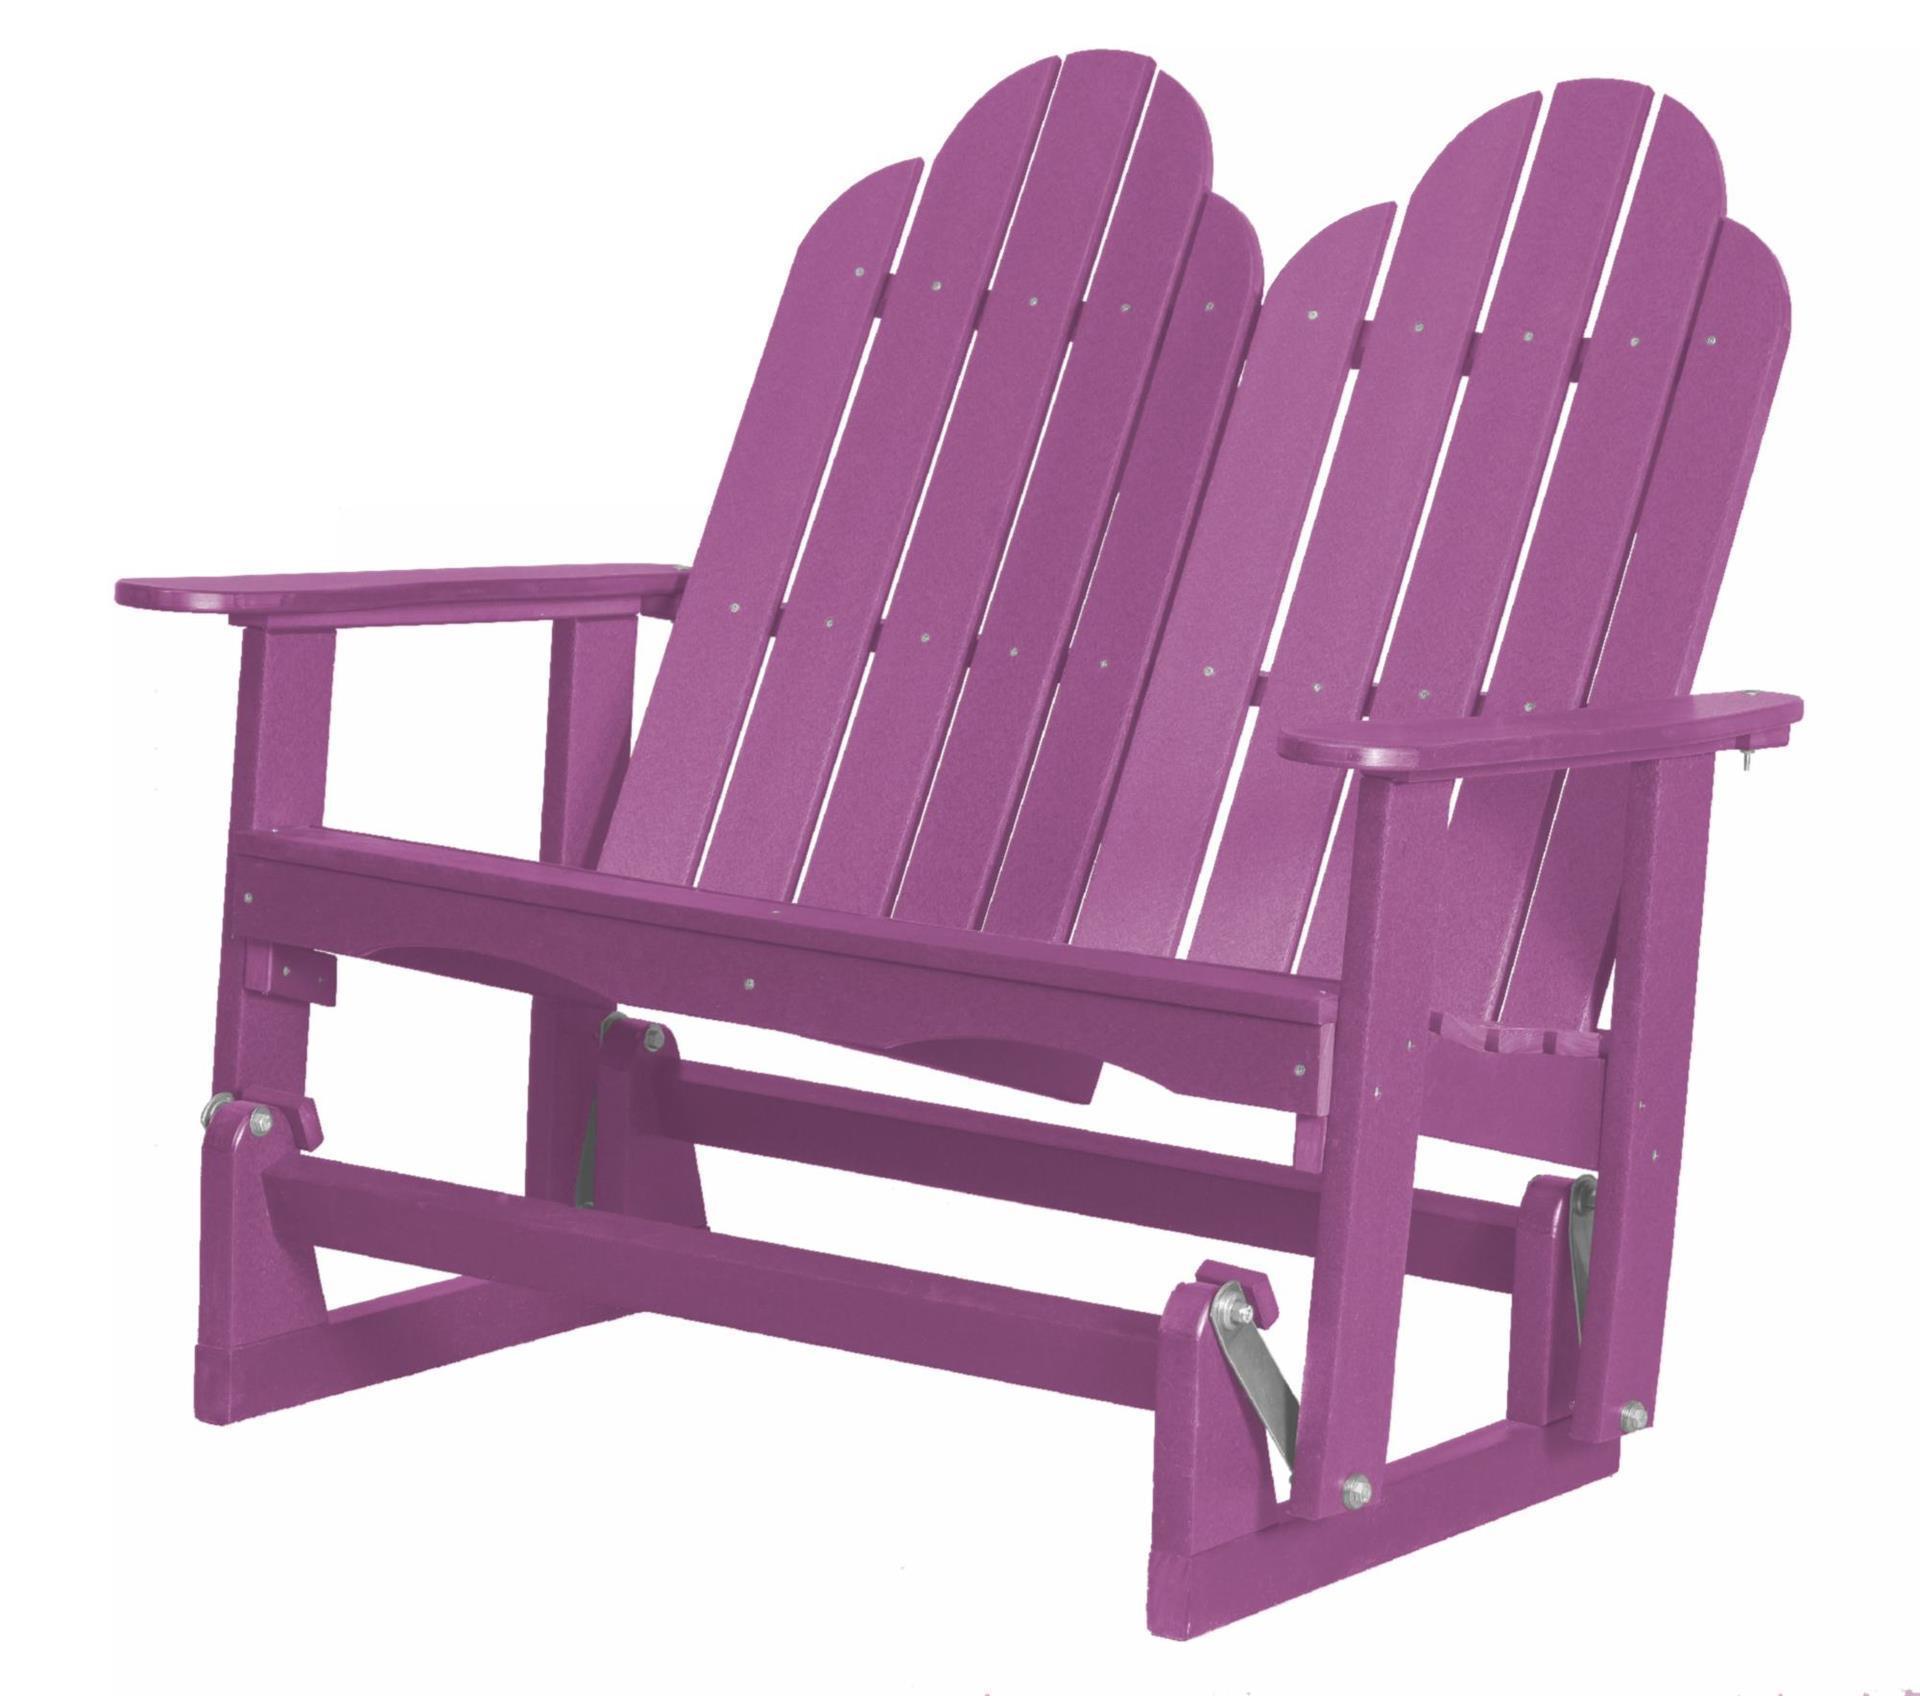 Outdoor Poly Furniture Adirondack Glider